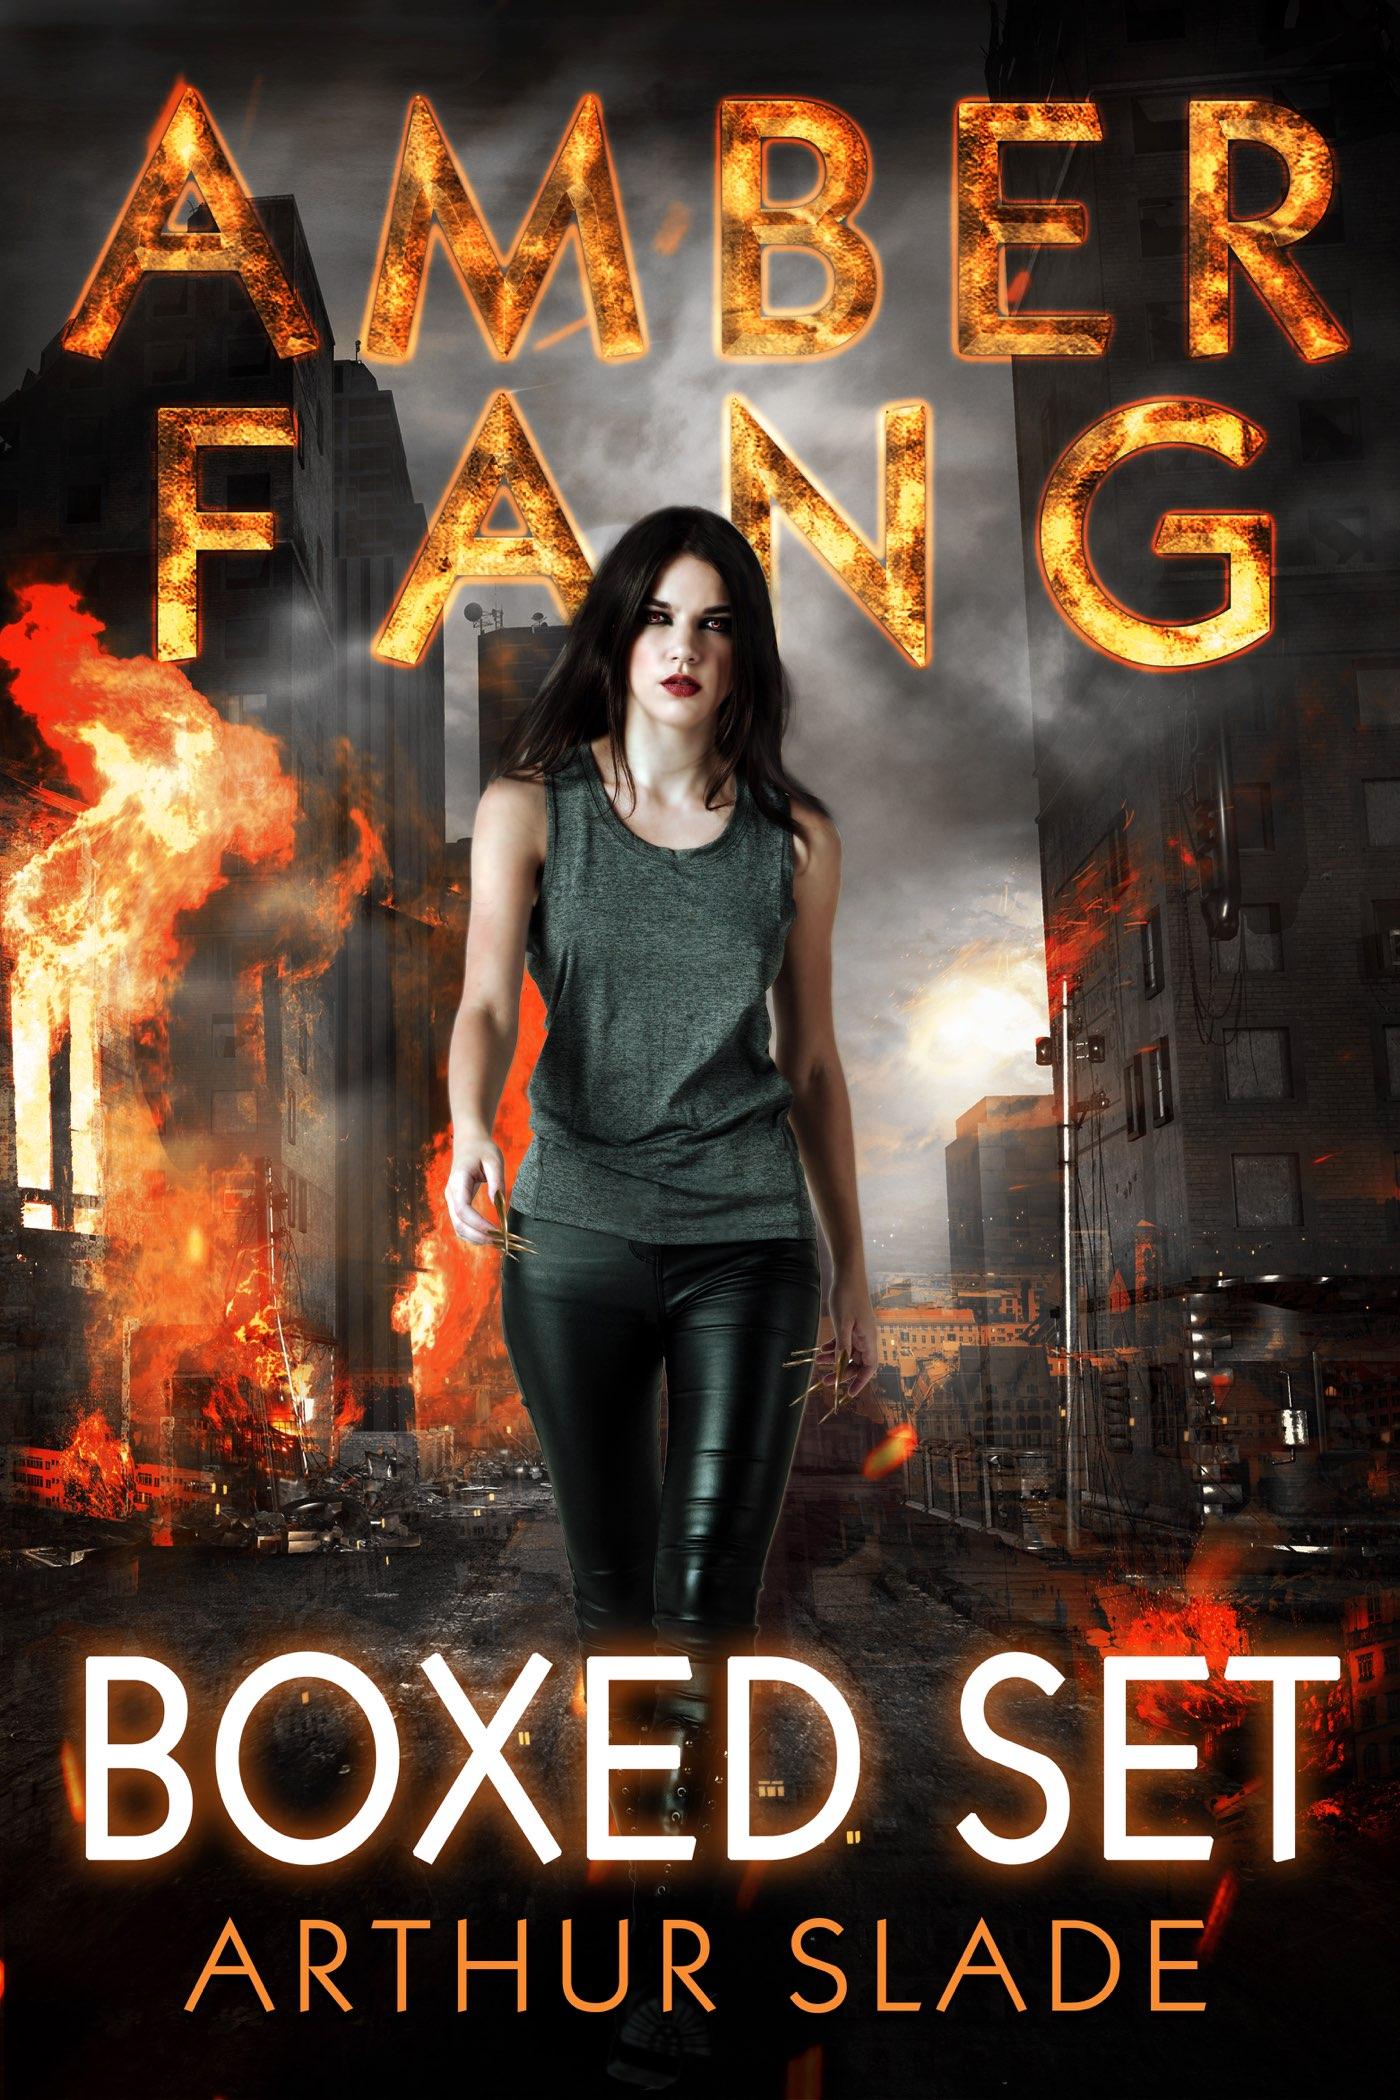 Amber-Fang-Boxed-Set-Generic.jpg